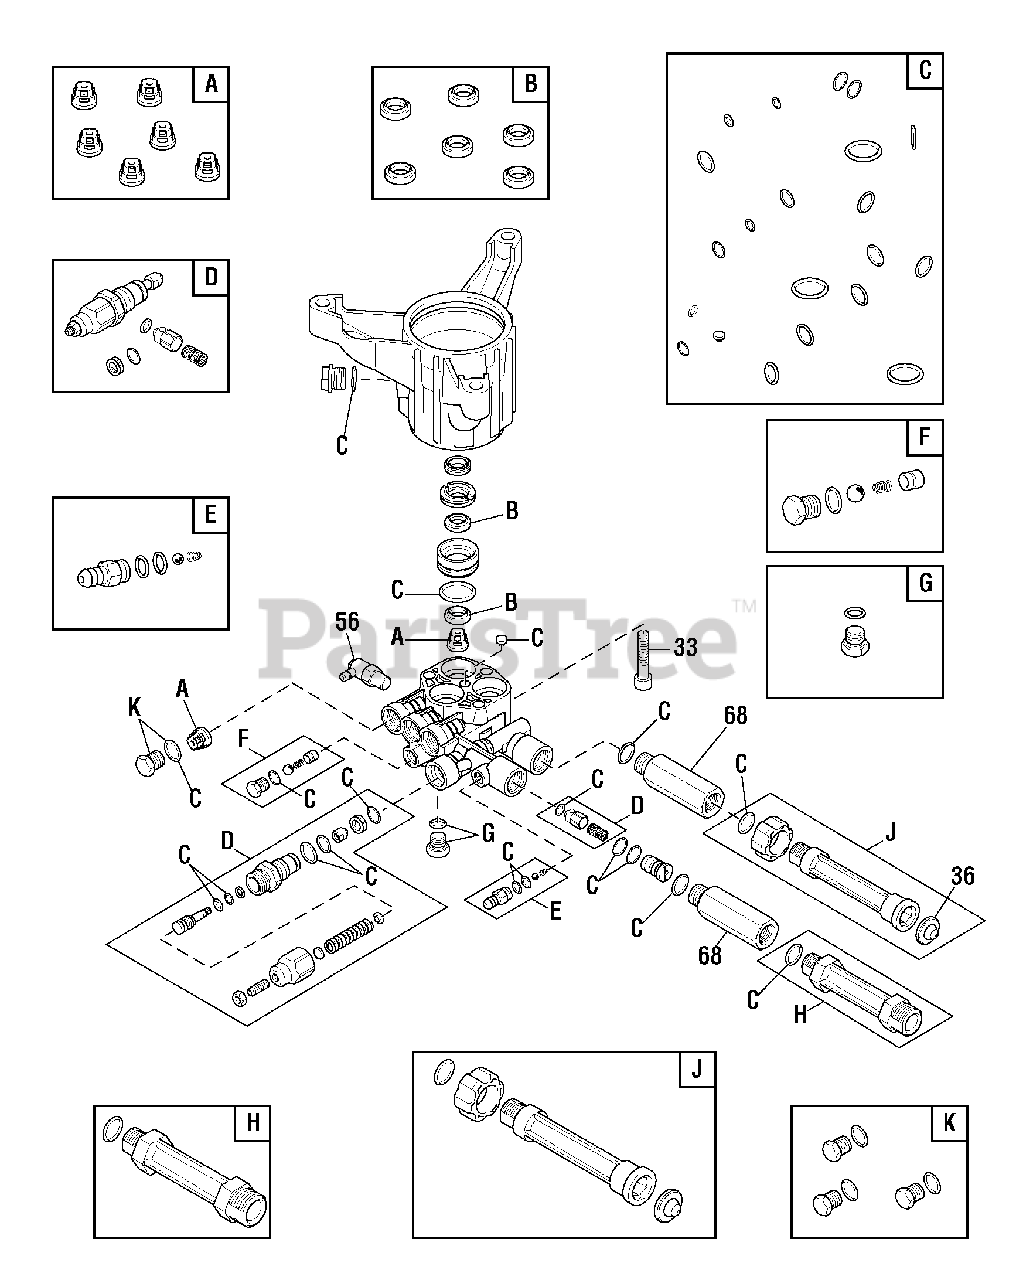 Troy-Bilt 020641-00 - Troy-Bilt 3,100 PSI Pressure Washer ...